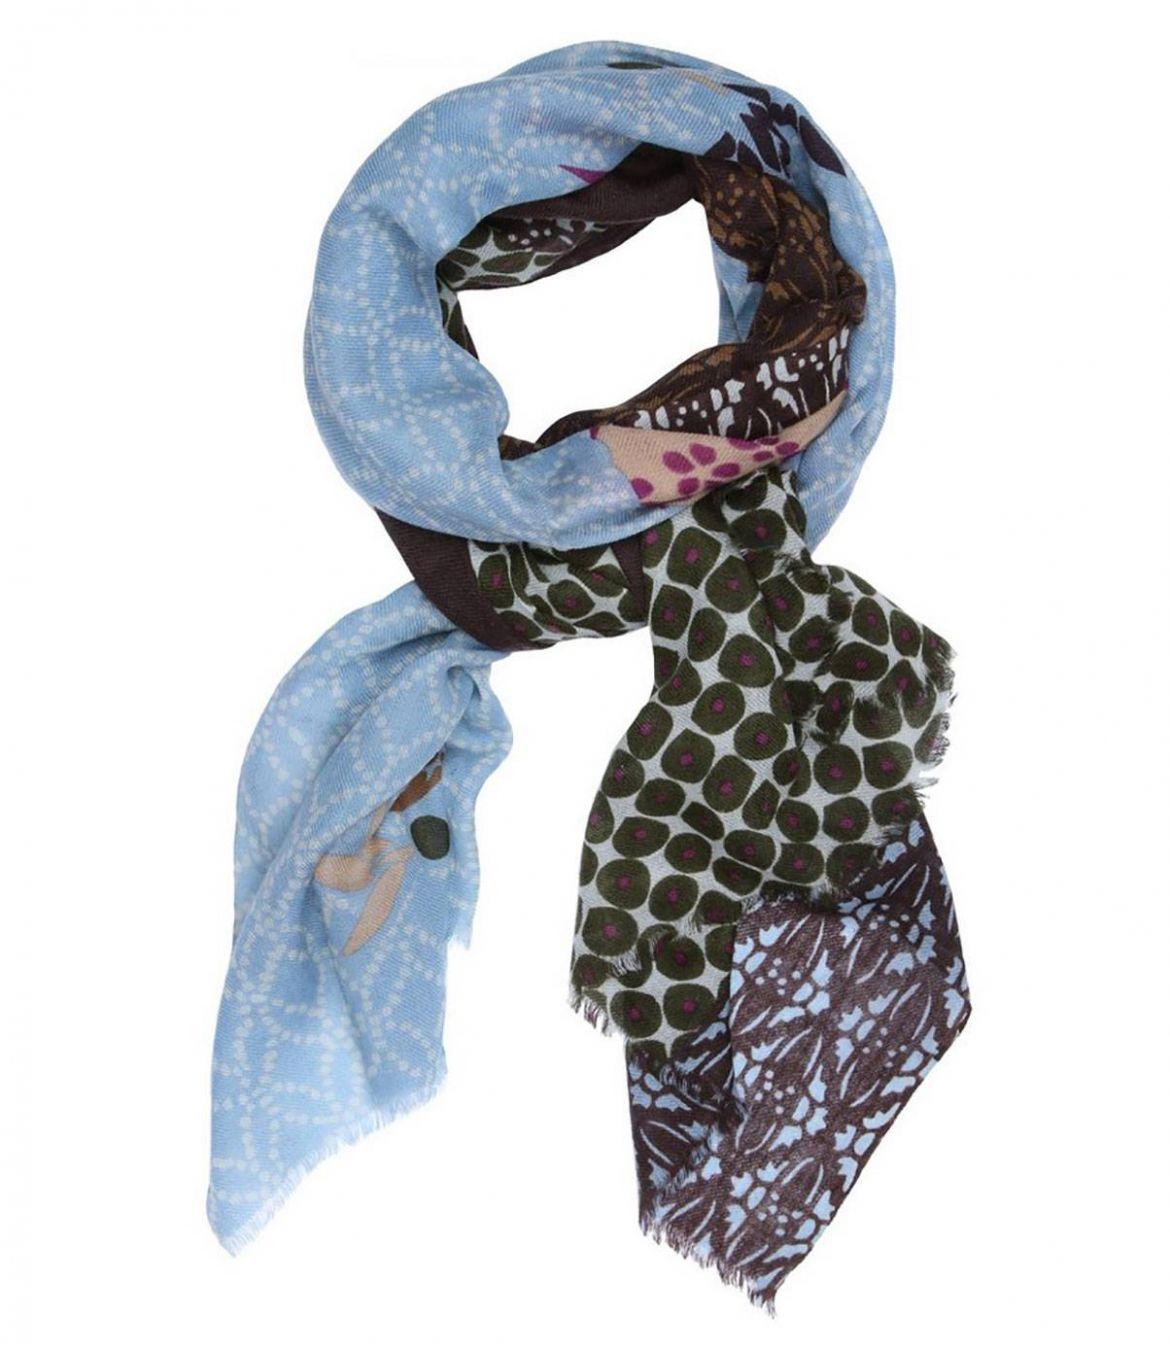 MIXE Women's Wool Scarf 75x190 cm Storiatipic - 1